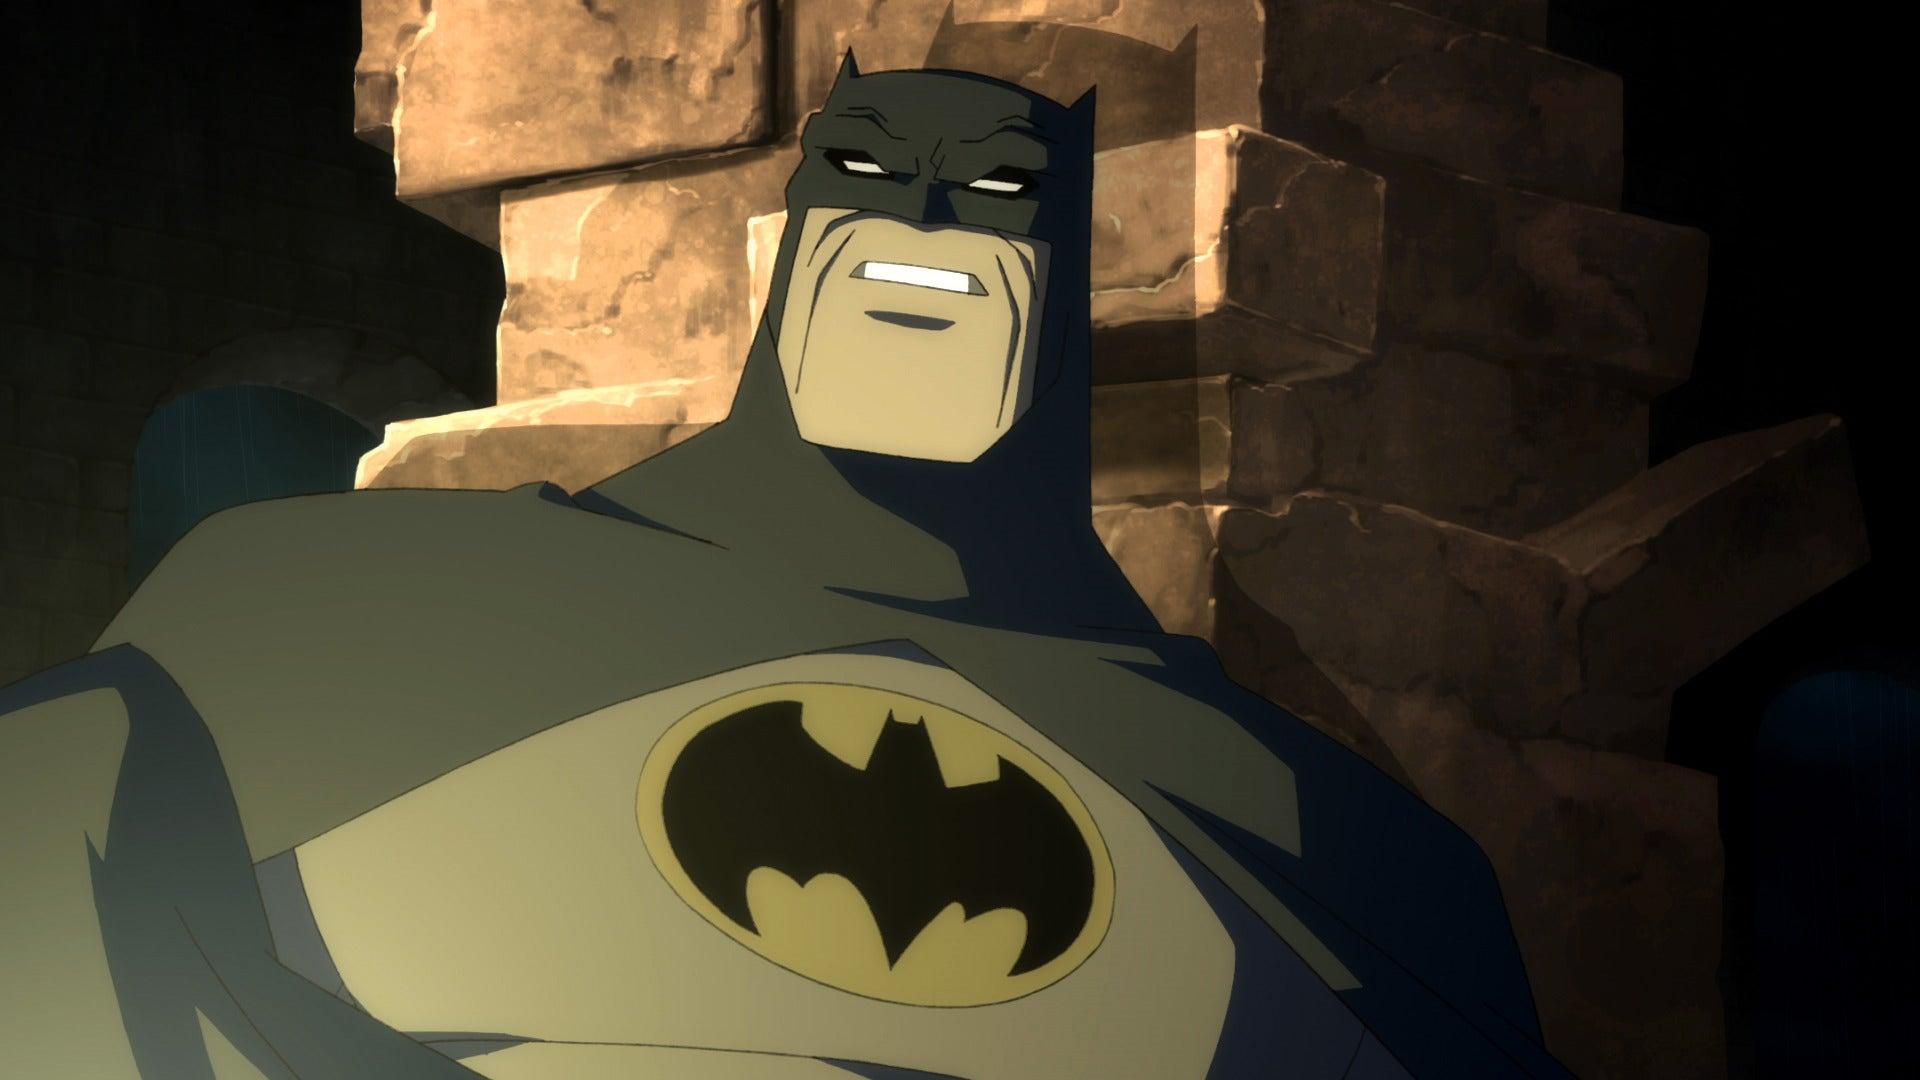 Batman-The Dark Knight Returns Part 1